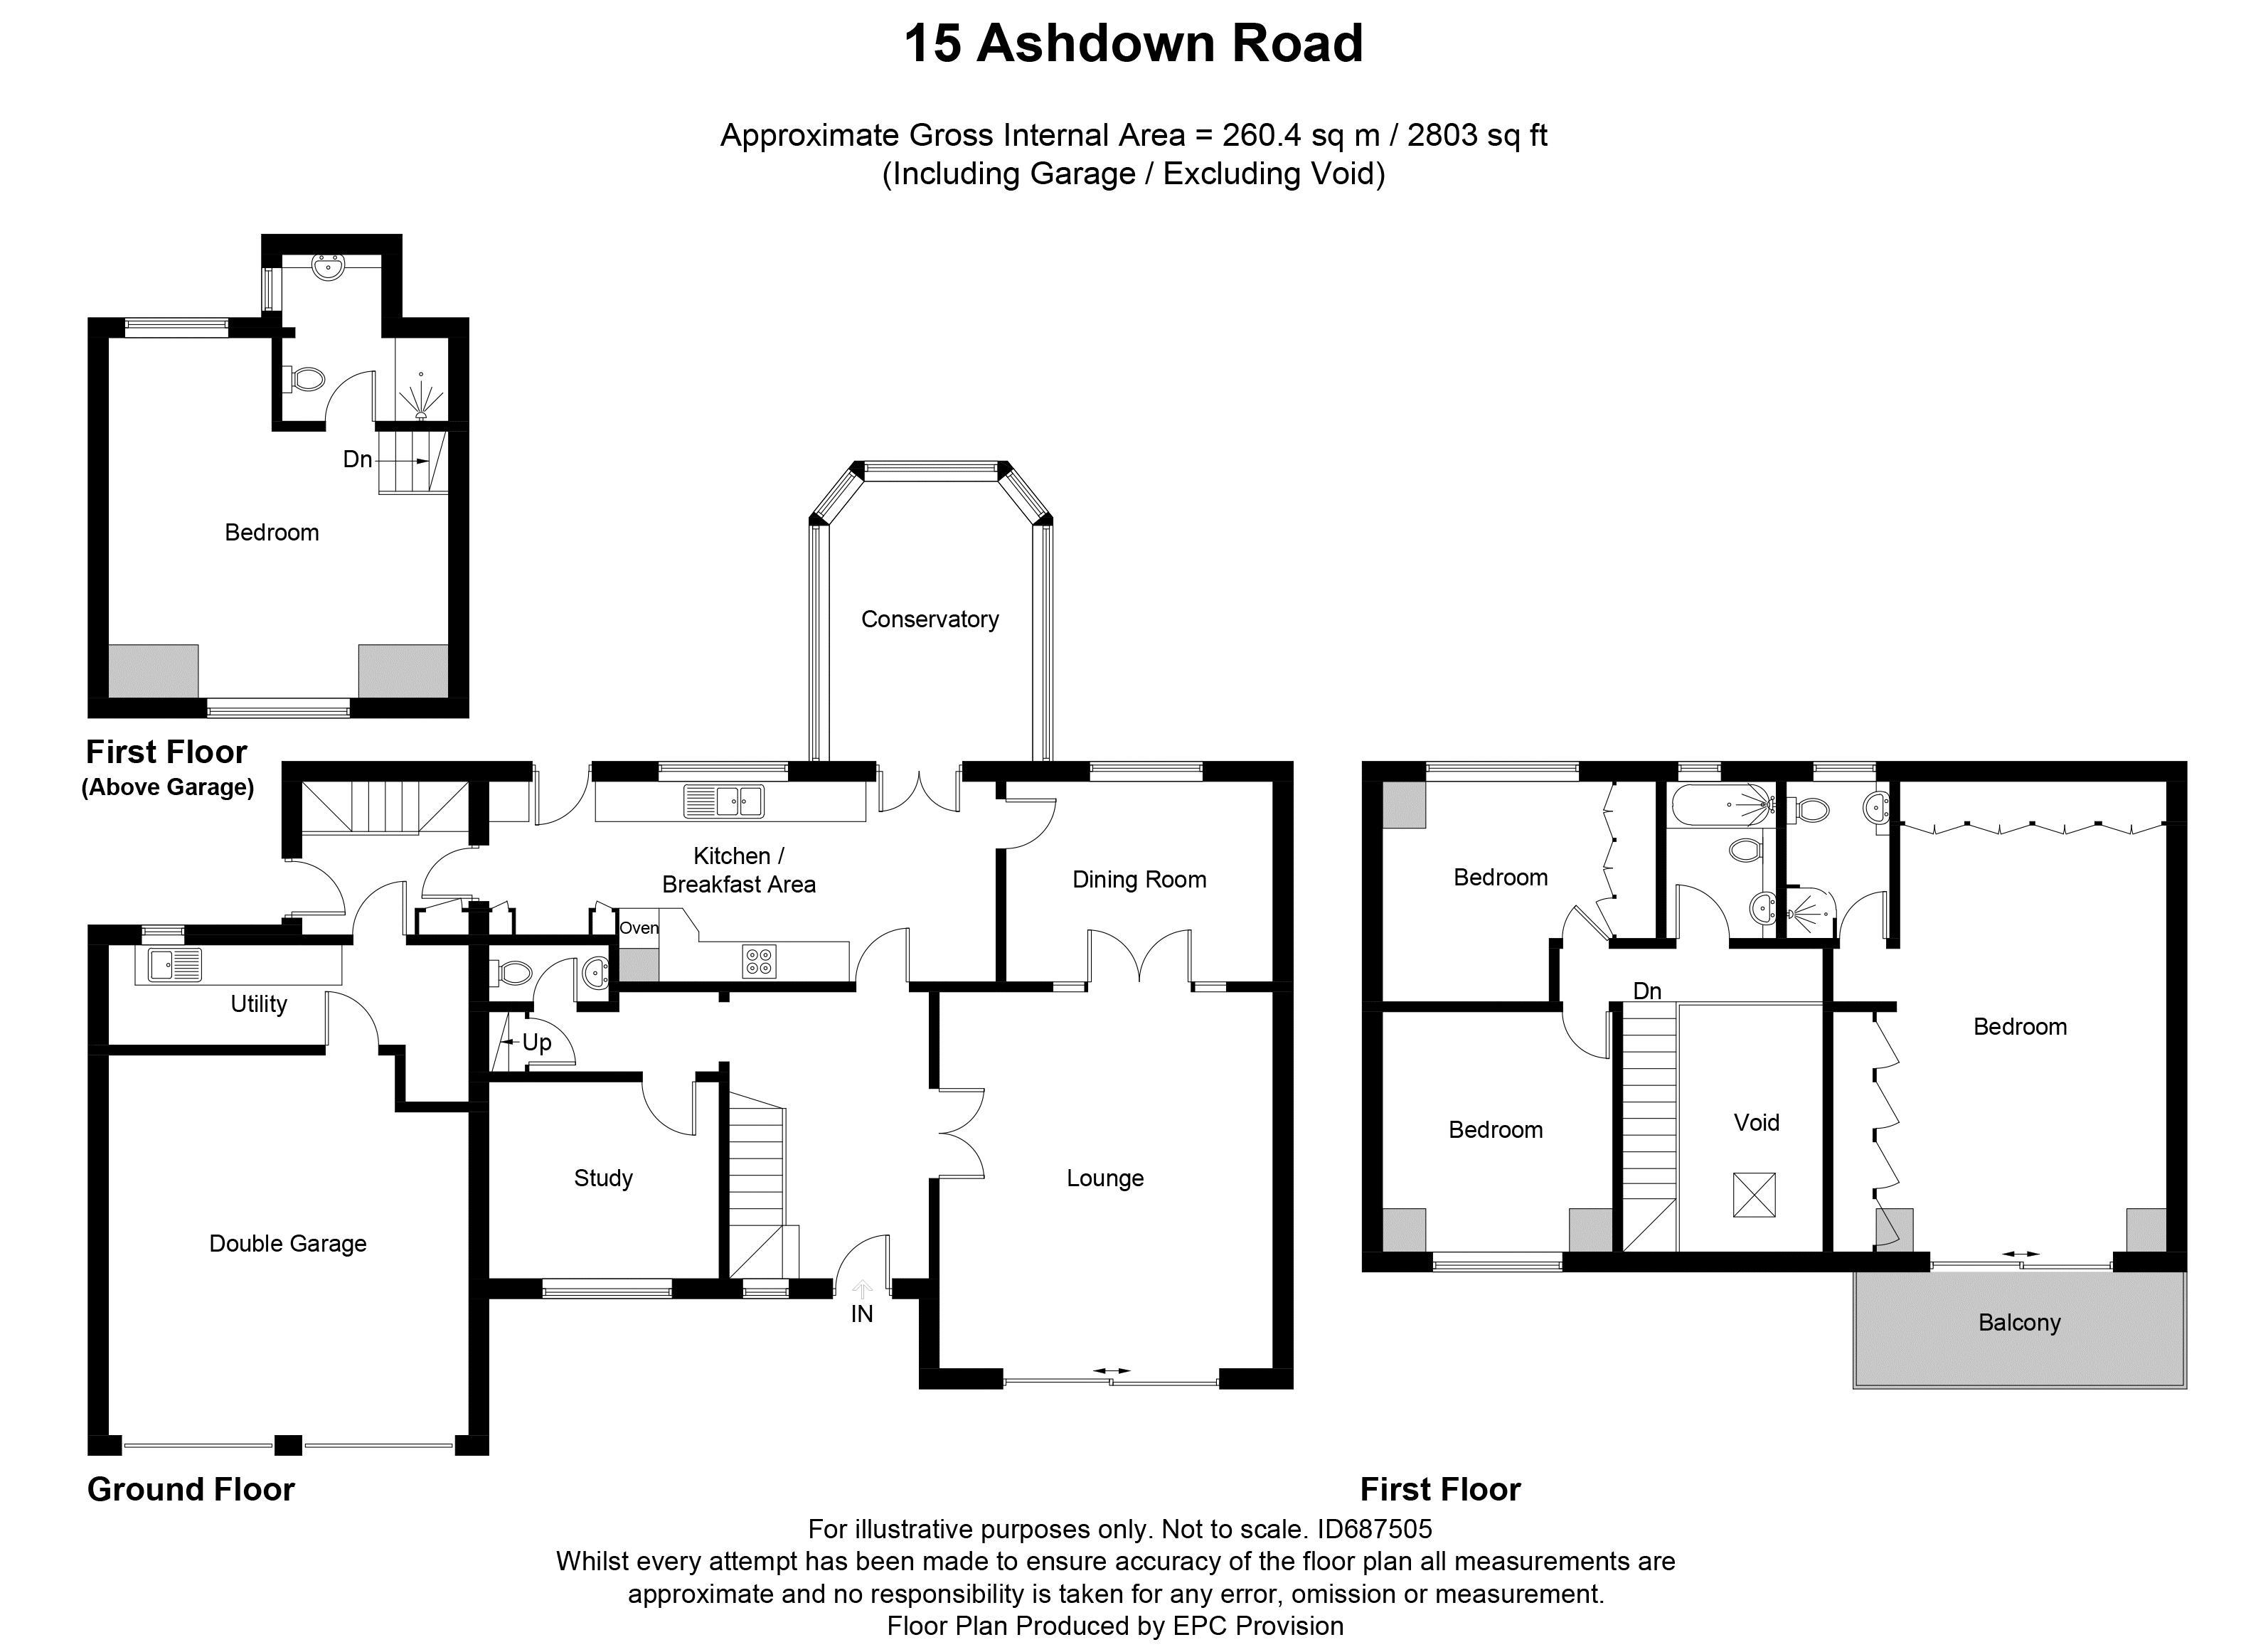 15 Ashdown Road